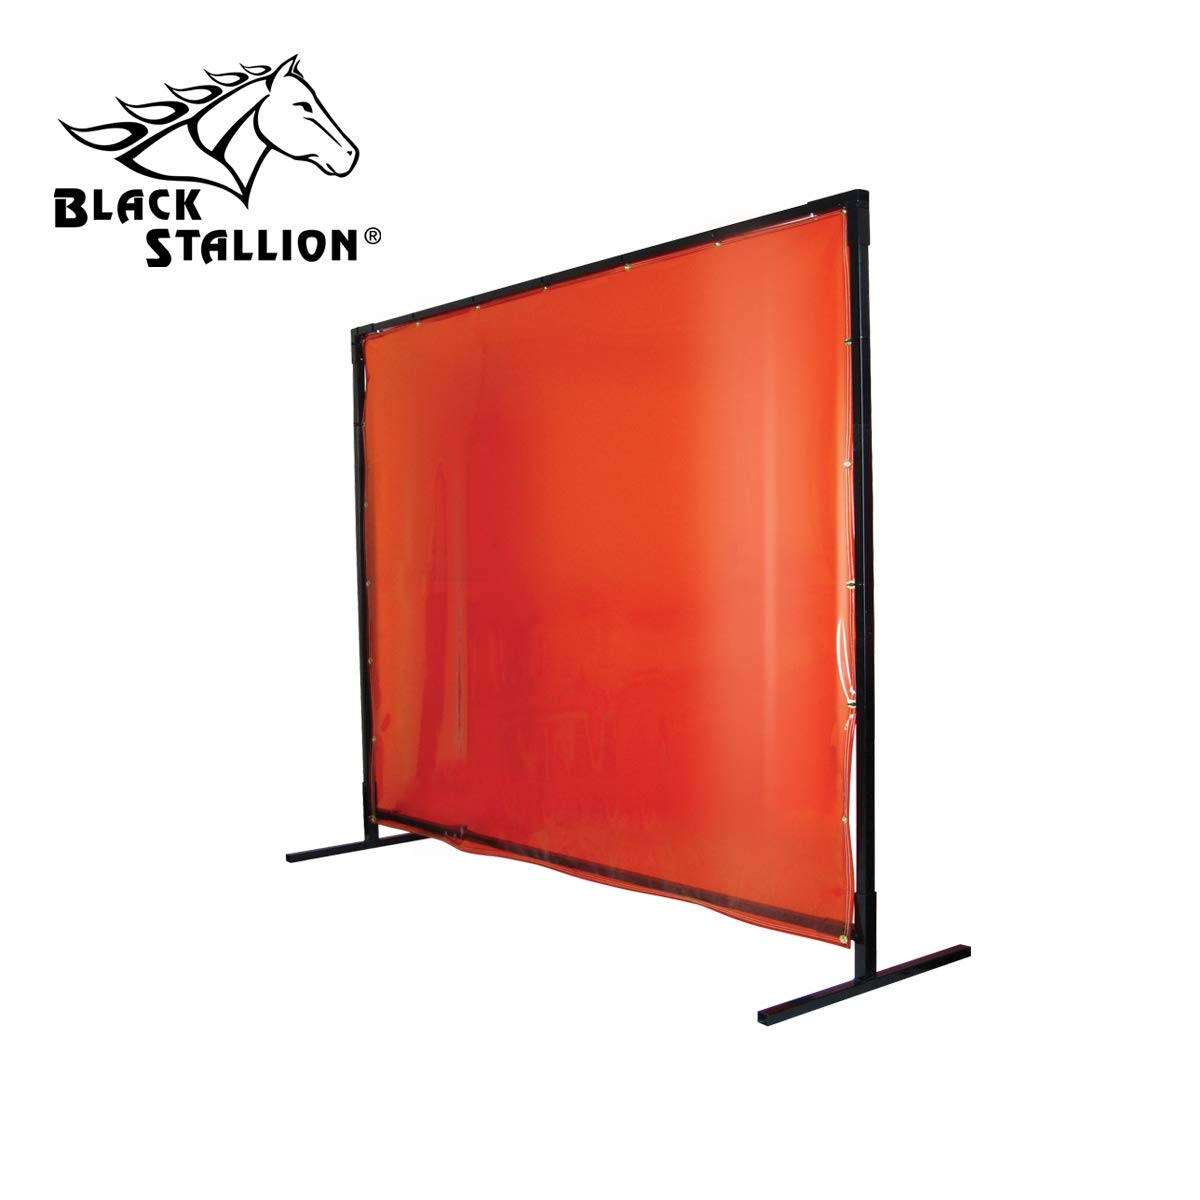 Revco 6X8VF1-ORA 6'X8' 14 mil. 1 Panel Orange Saf-Vu Welding Screen with Frame by Black Stallion